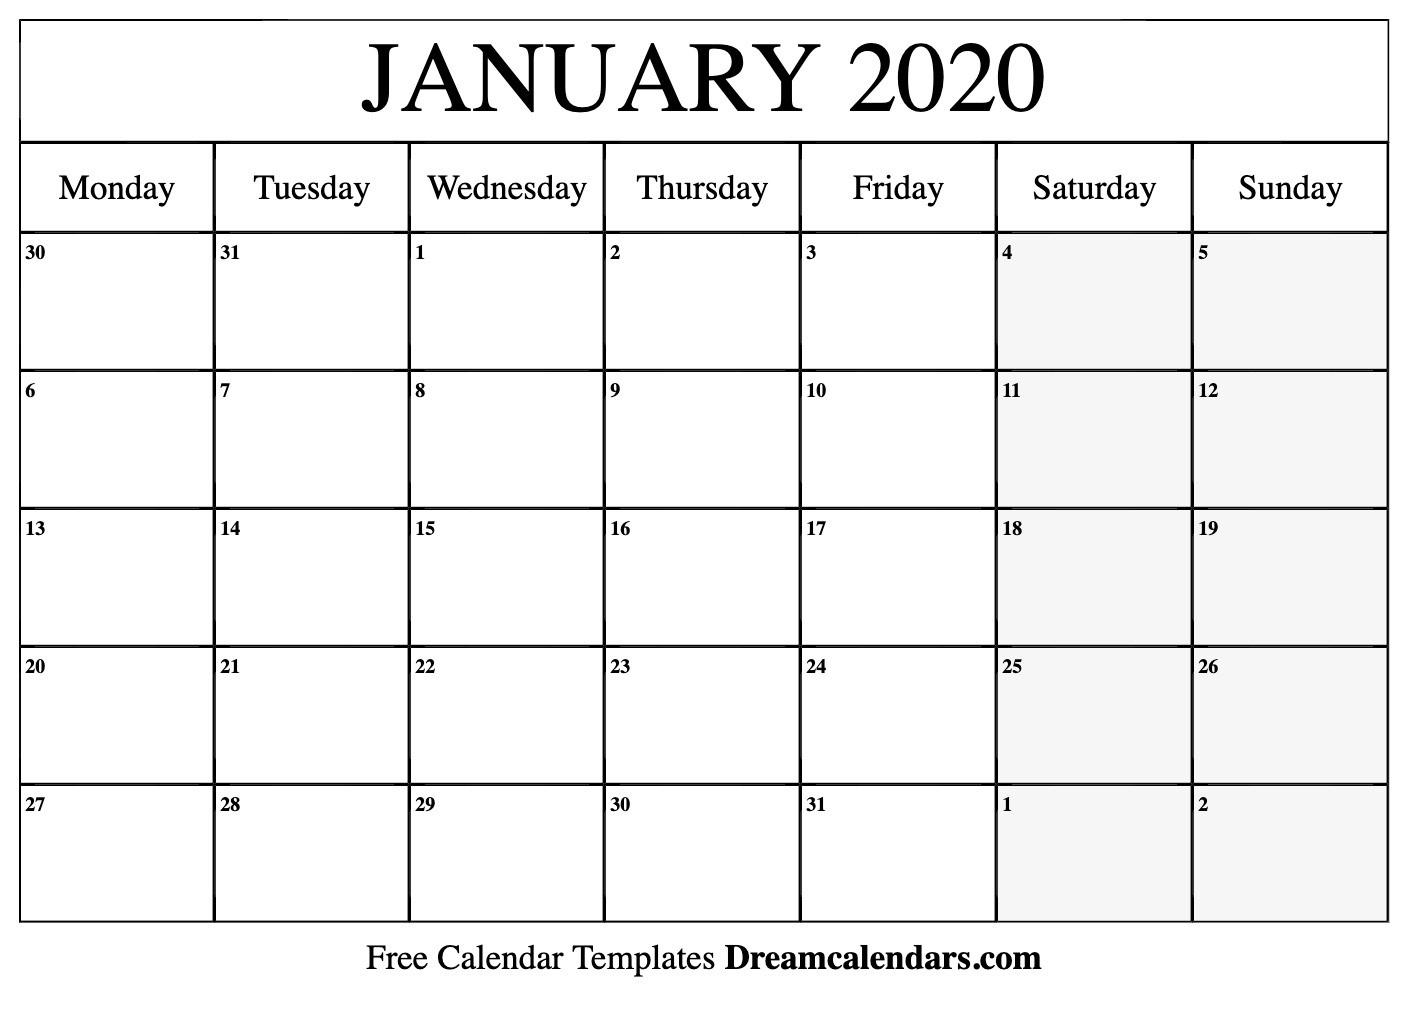 Printable January 2020 Calendar-January 2020 Calendar Dates